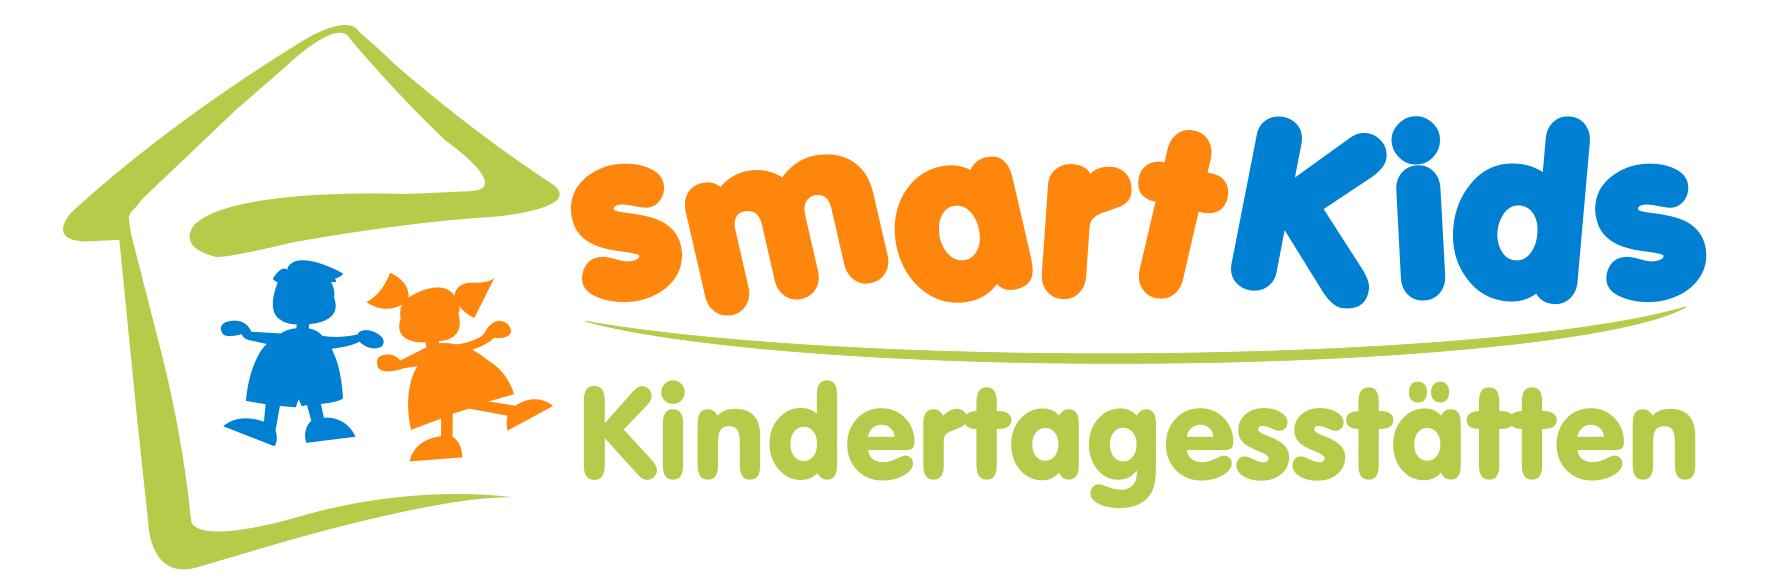 smartKids Kindertagesstätten gGmbH